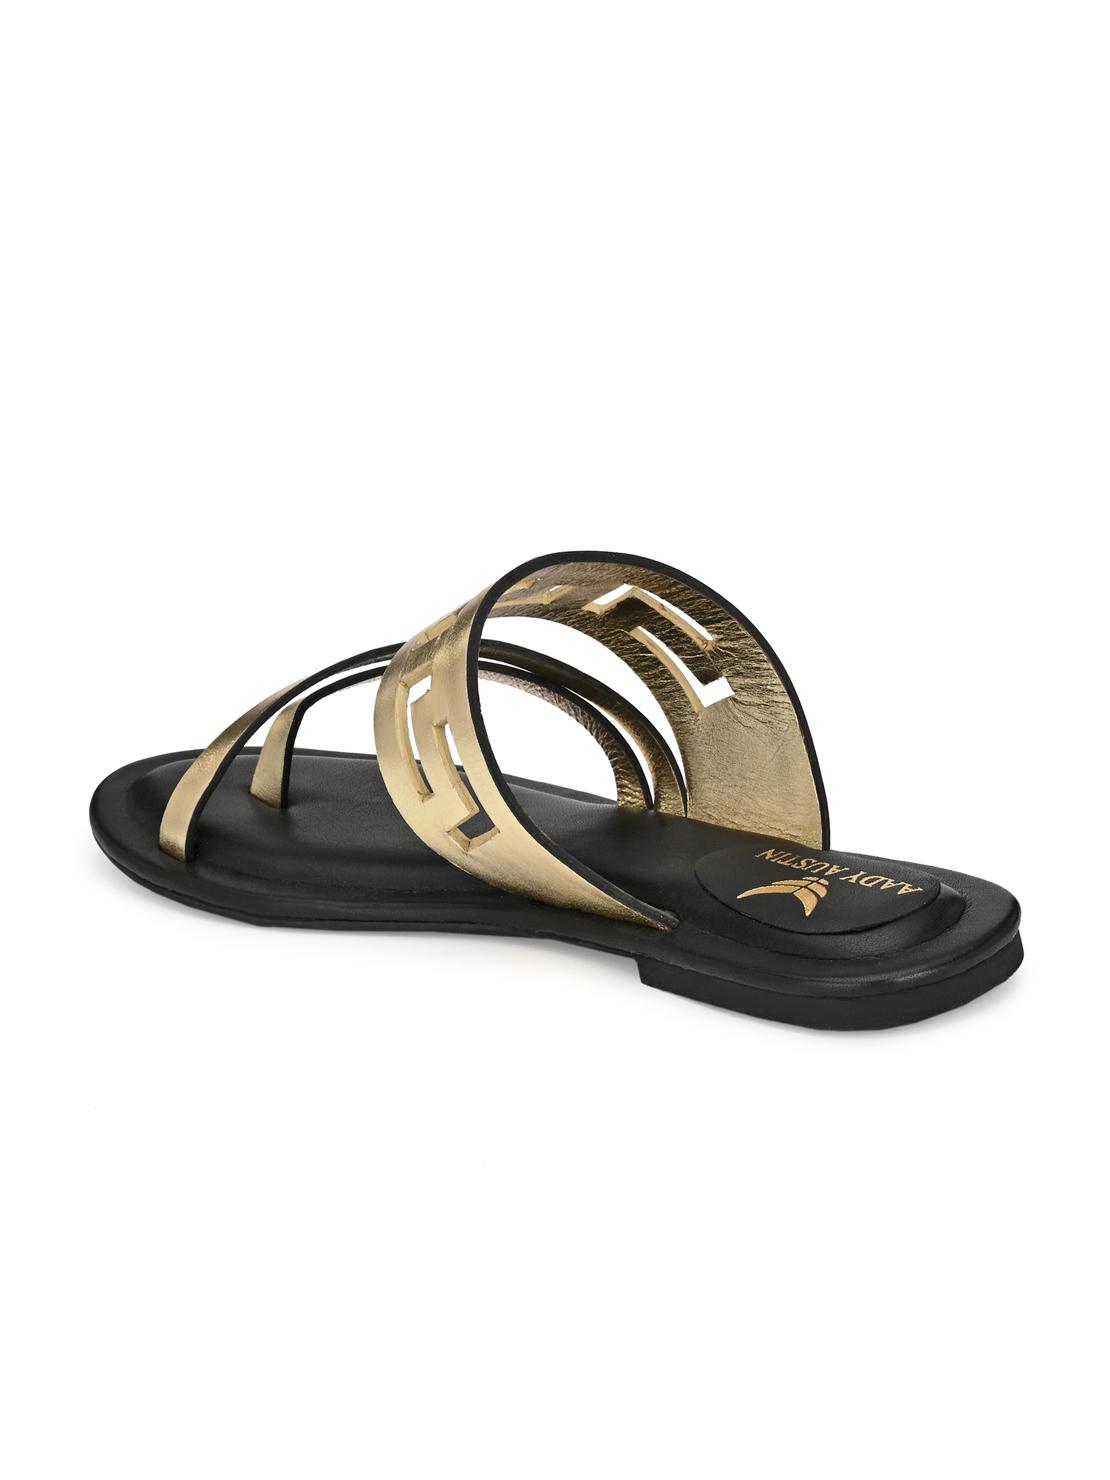 AADY AUSTIN   Aady Austin Women's Trendy Gold Round Toe Flats